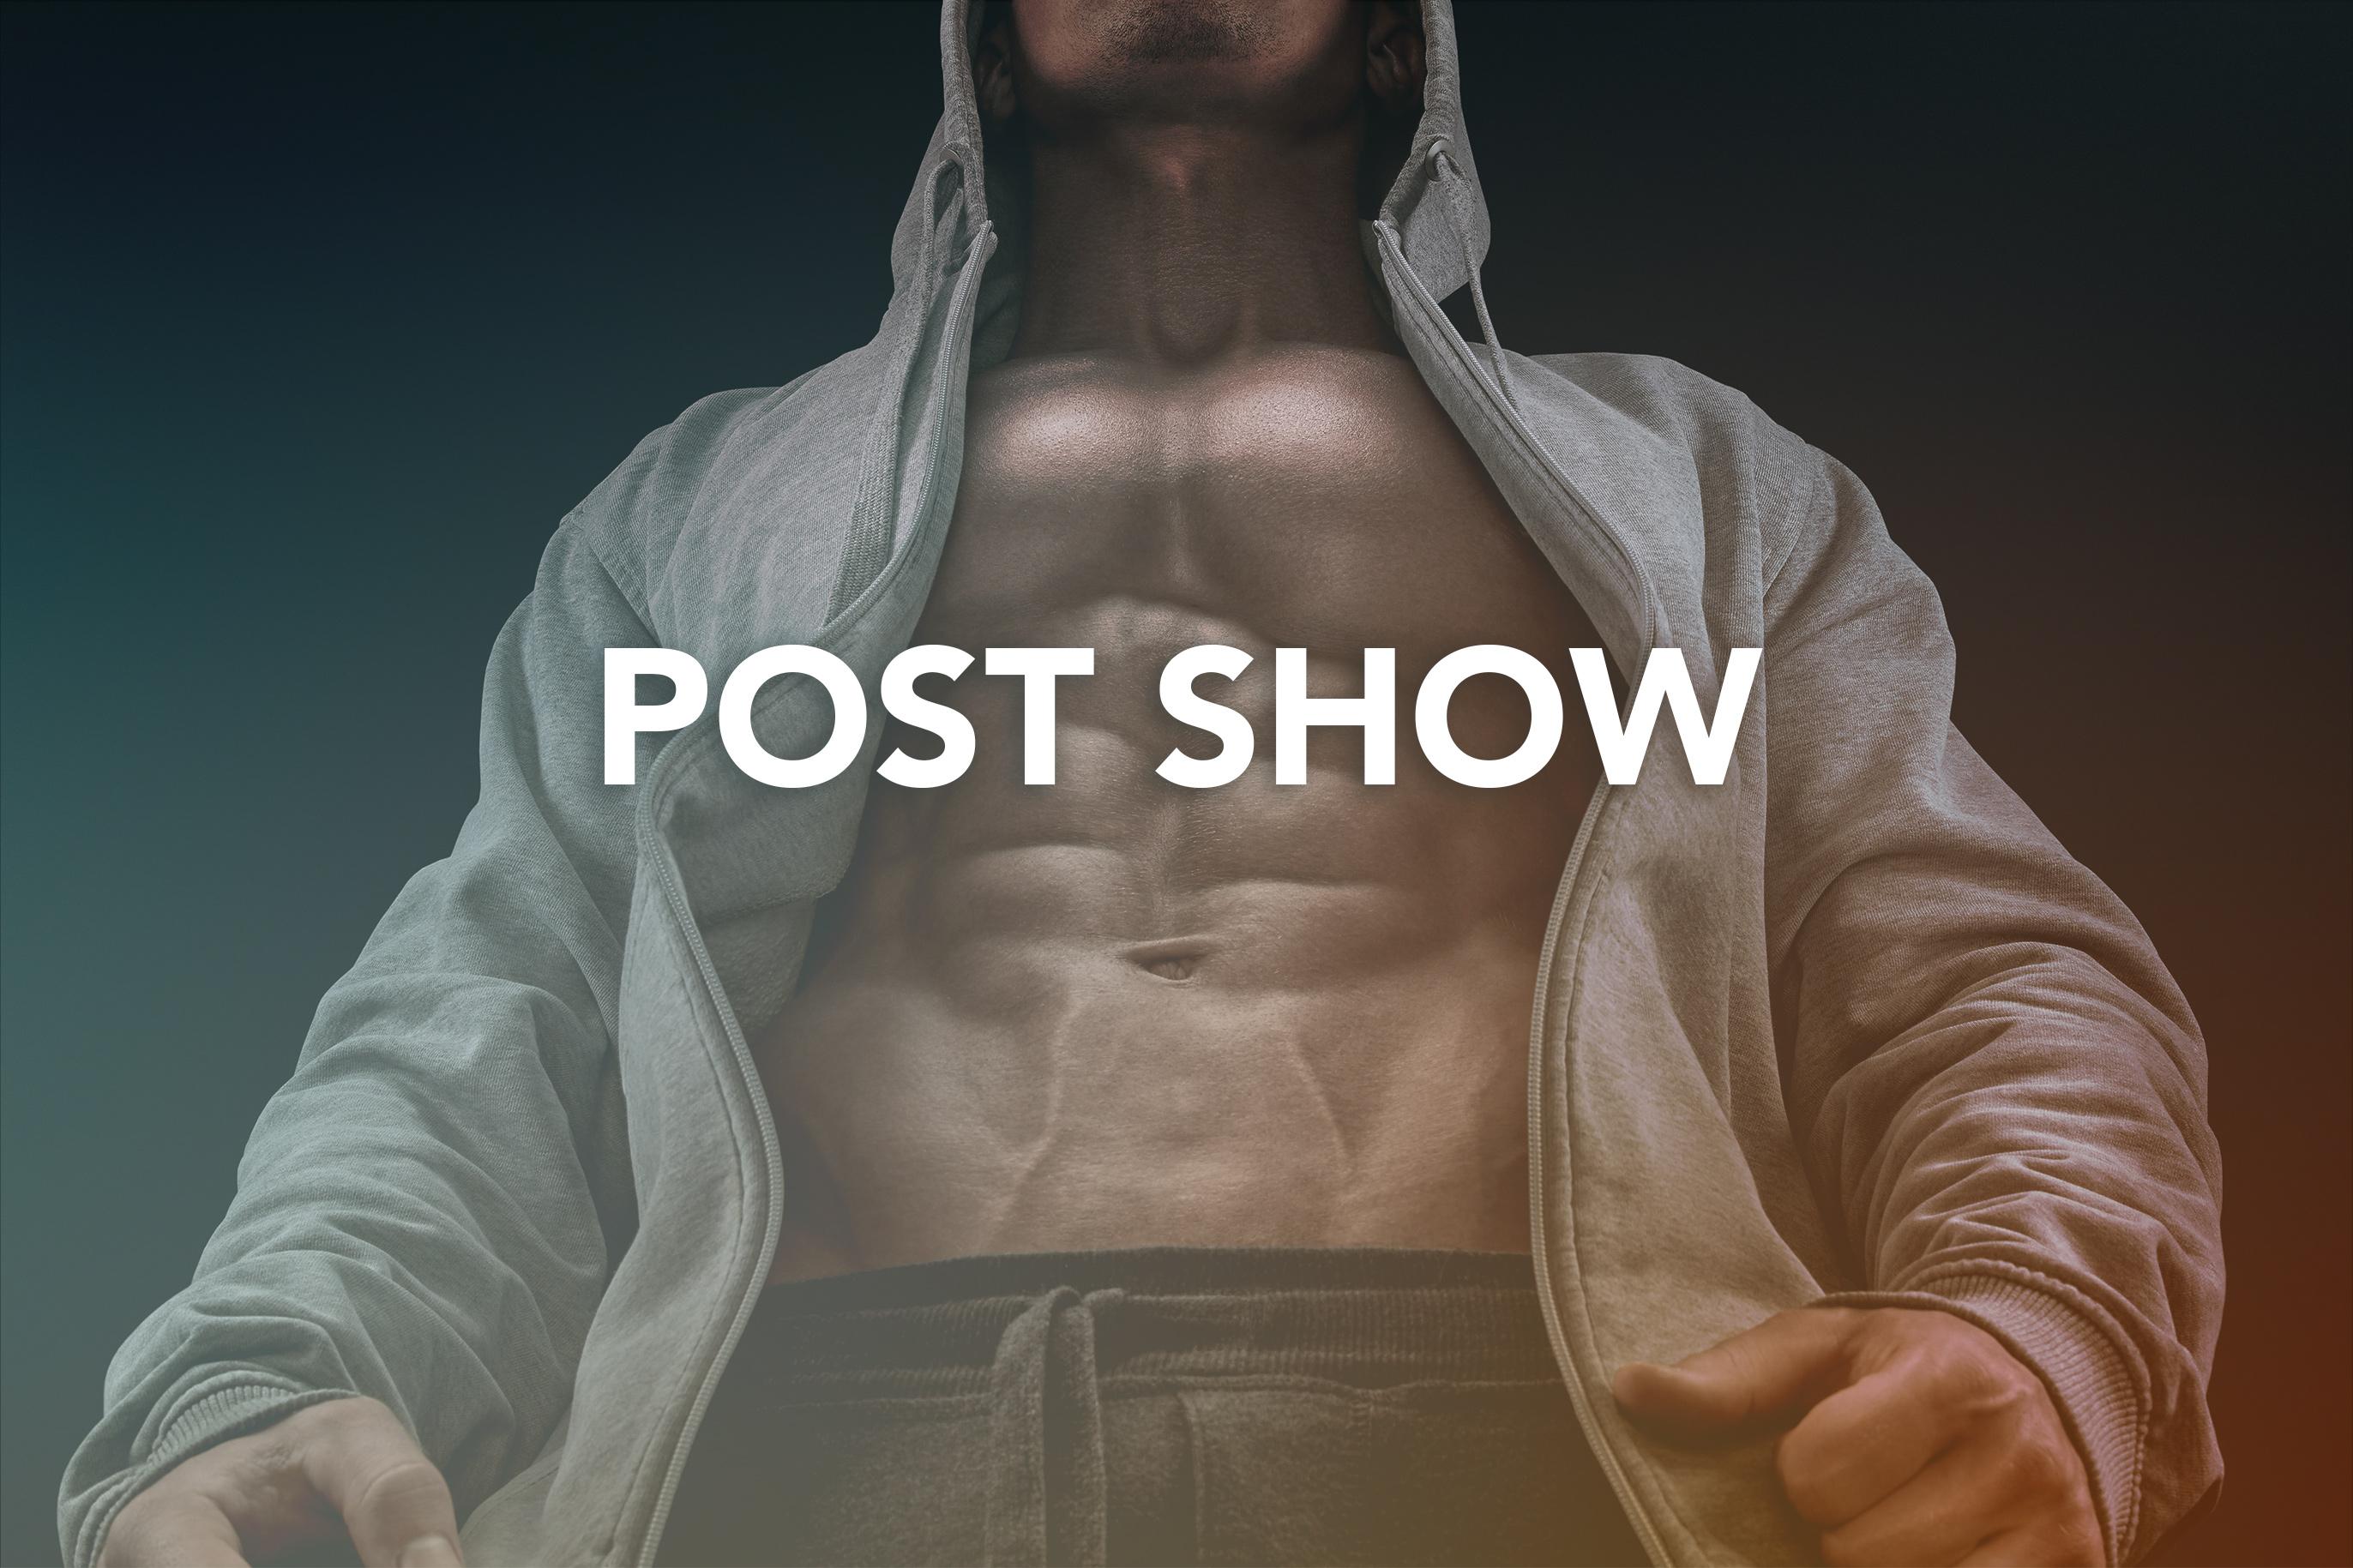 Post Show